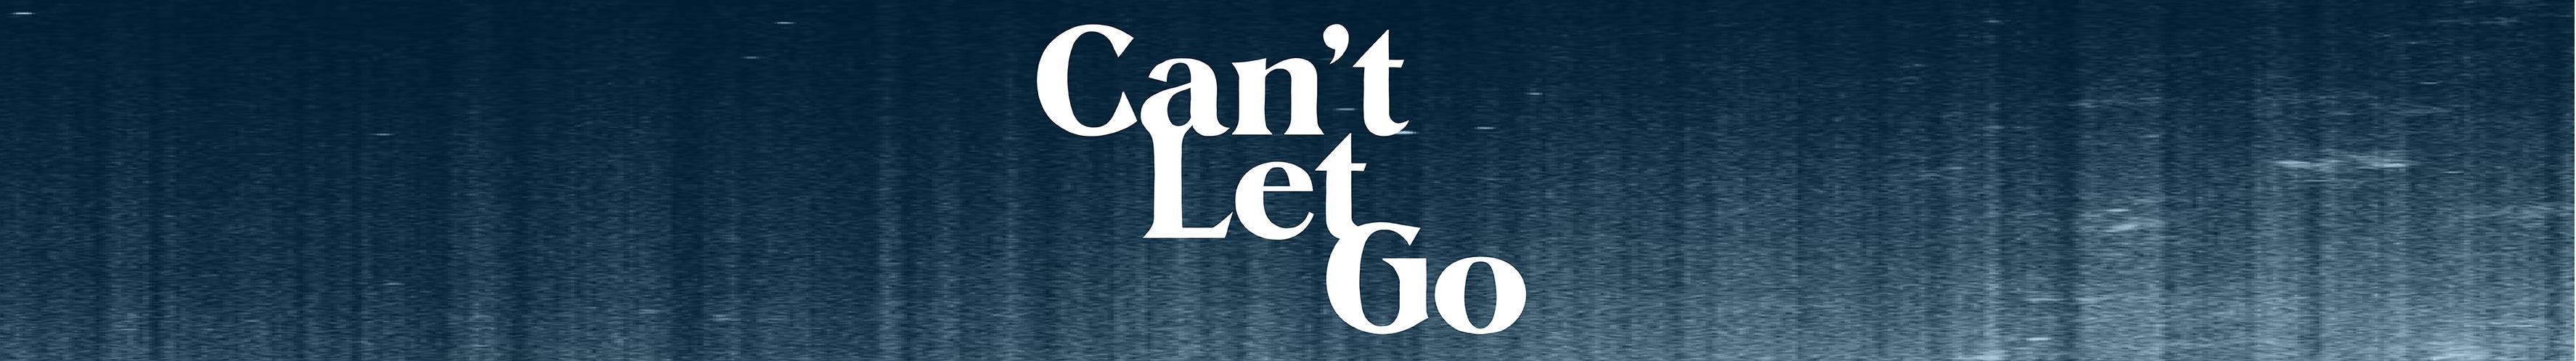 """Can't Let Go"" Robert Plant Alison Krauss"